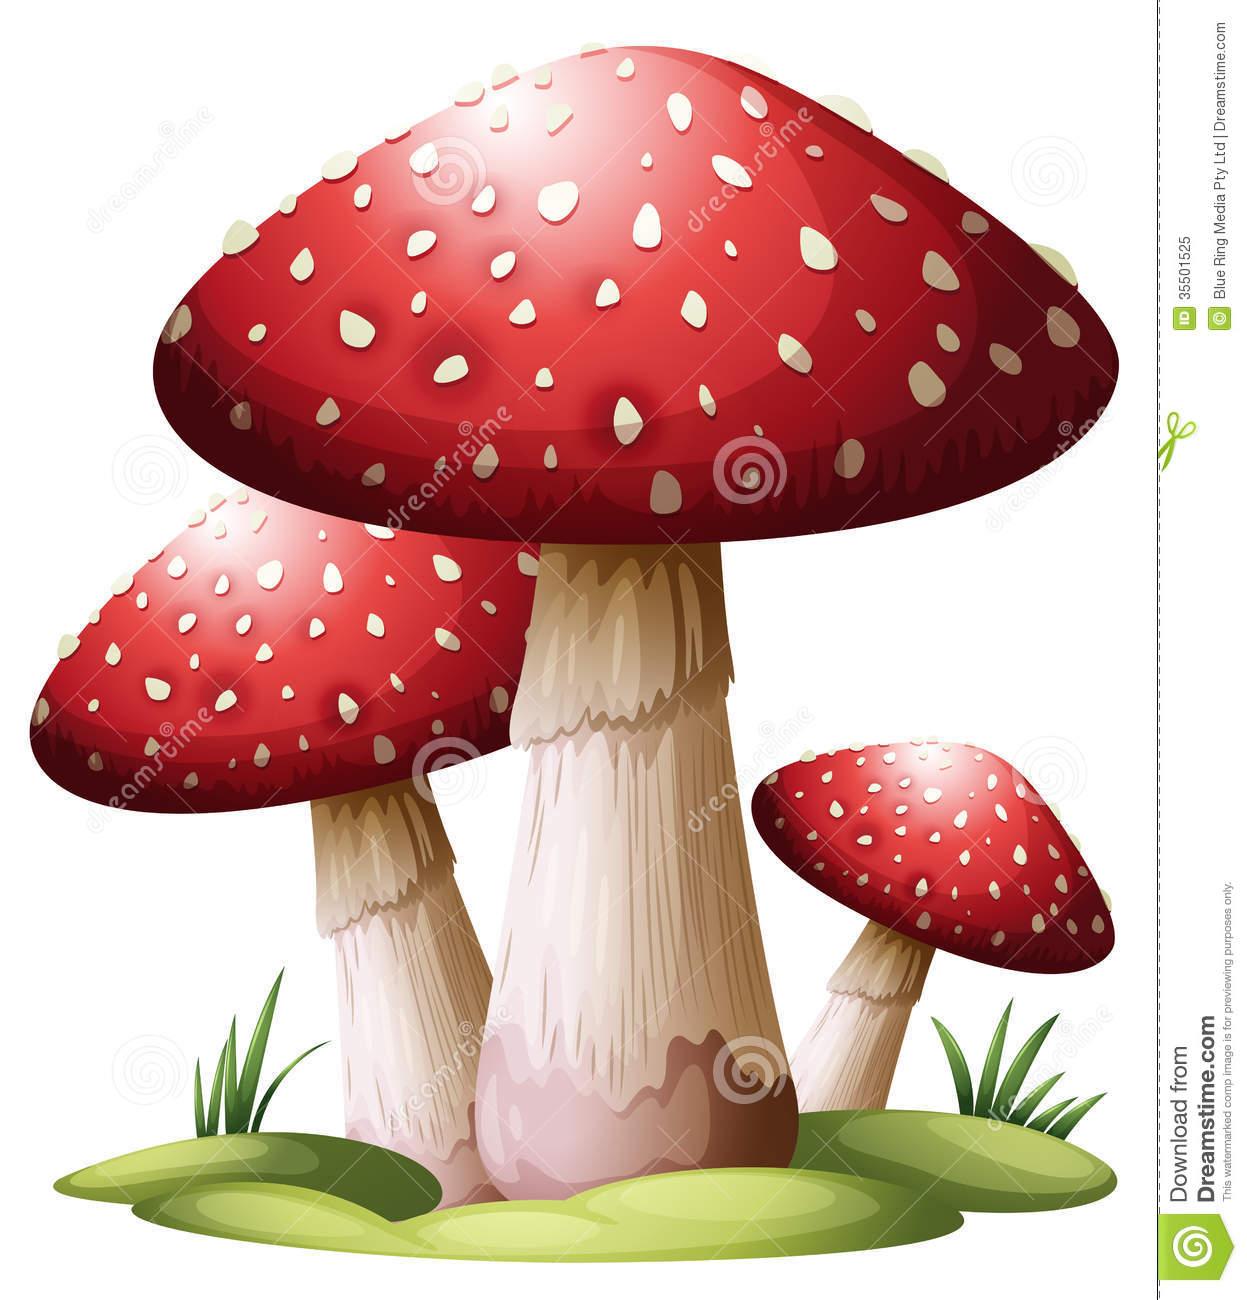 Red Mushroom Royalty Free Stock Photo.